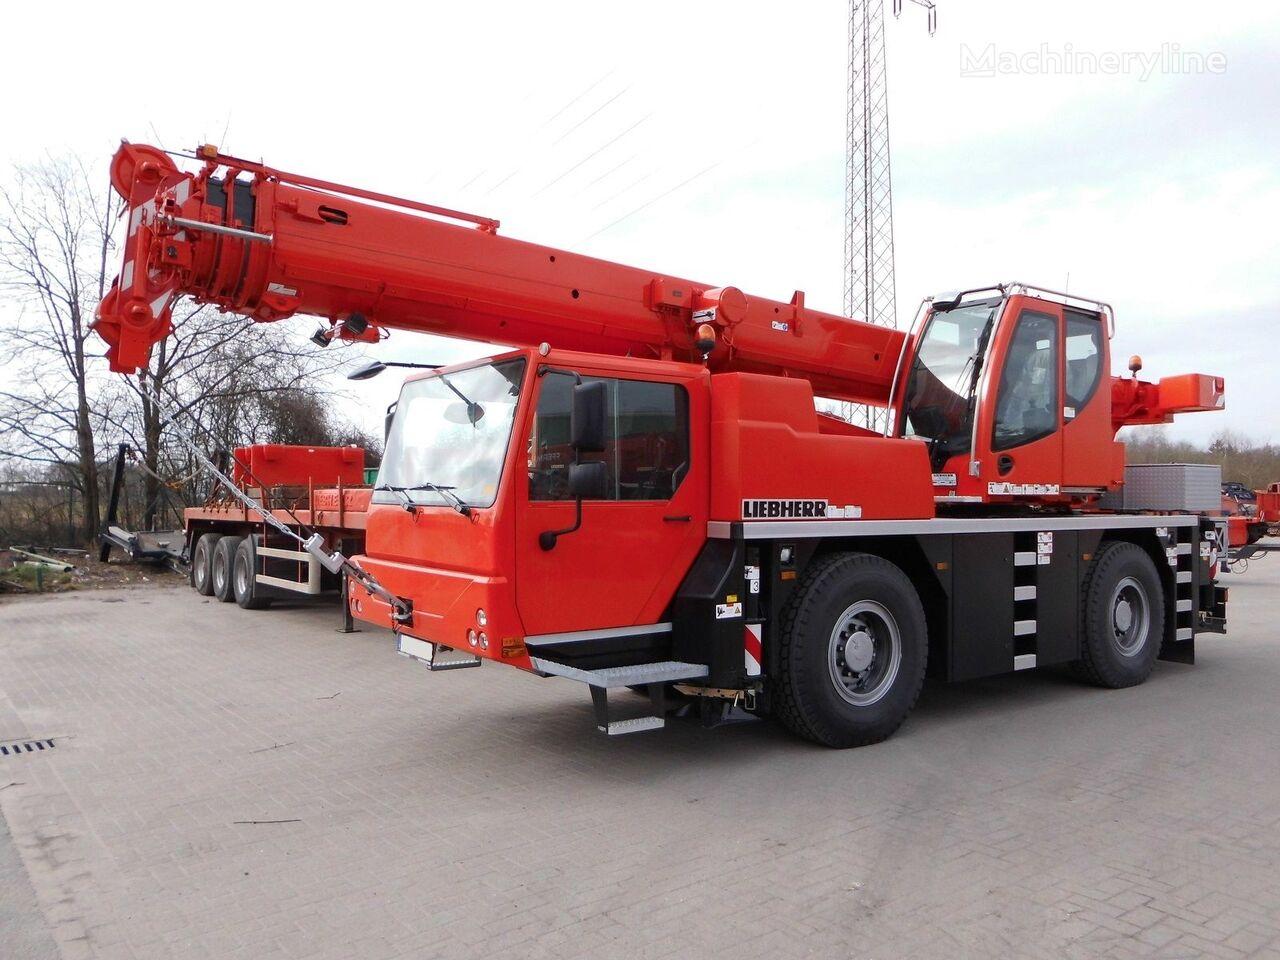 LTM 1030-2.1 on chassis LIEBHERR LTM 1030-2.1 mobile crane